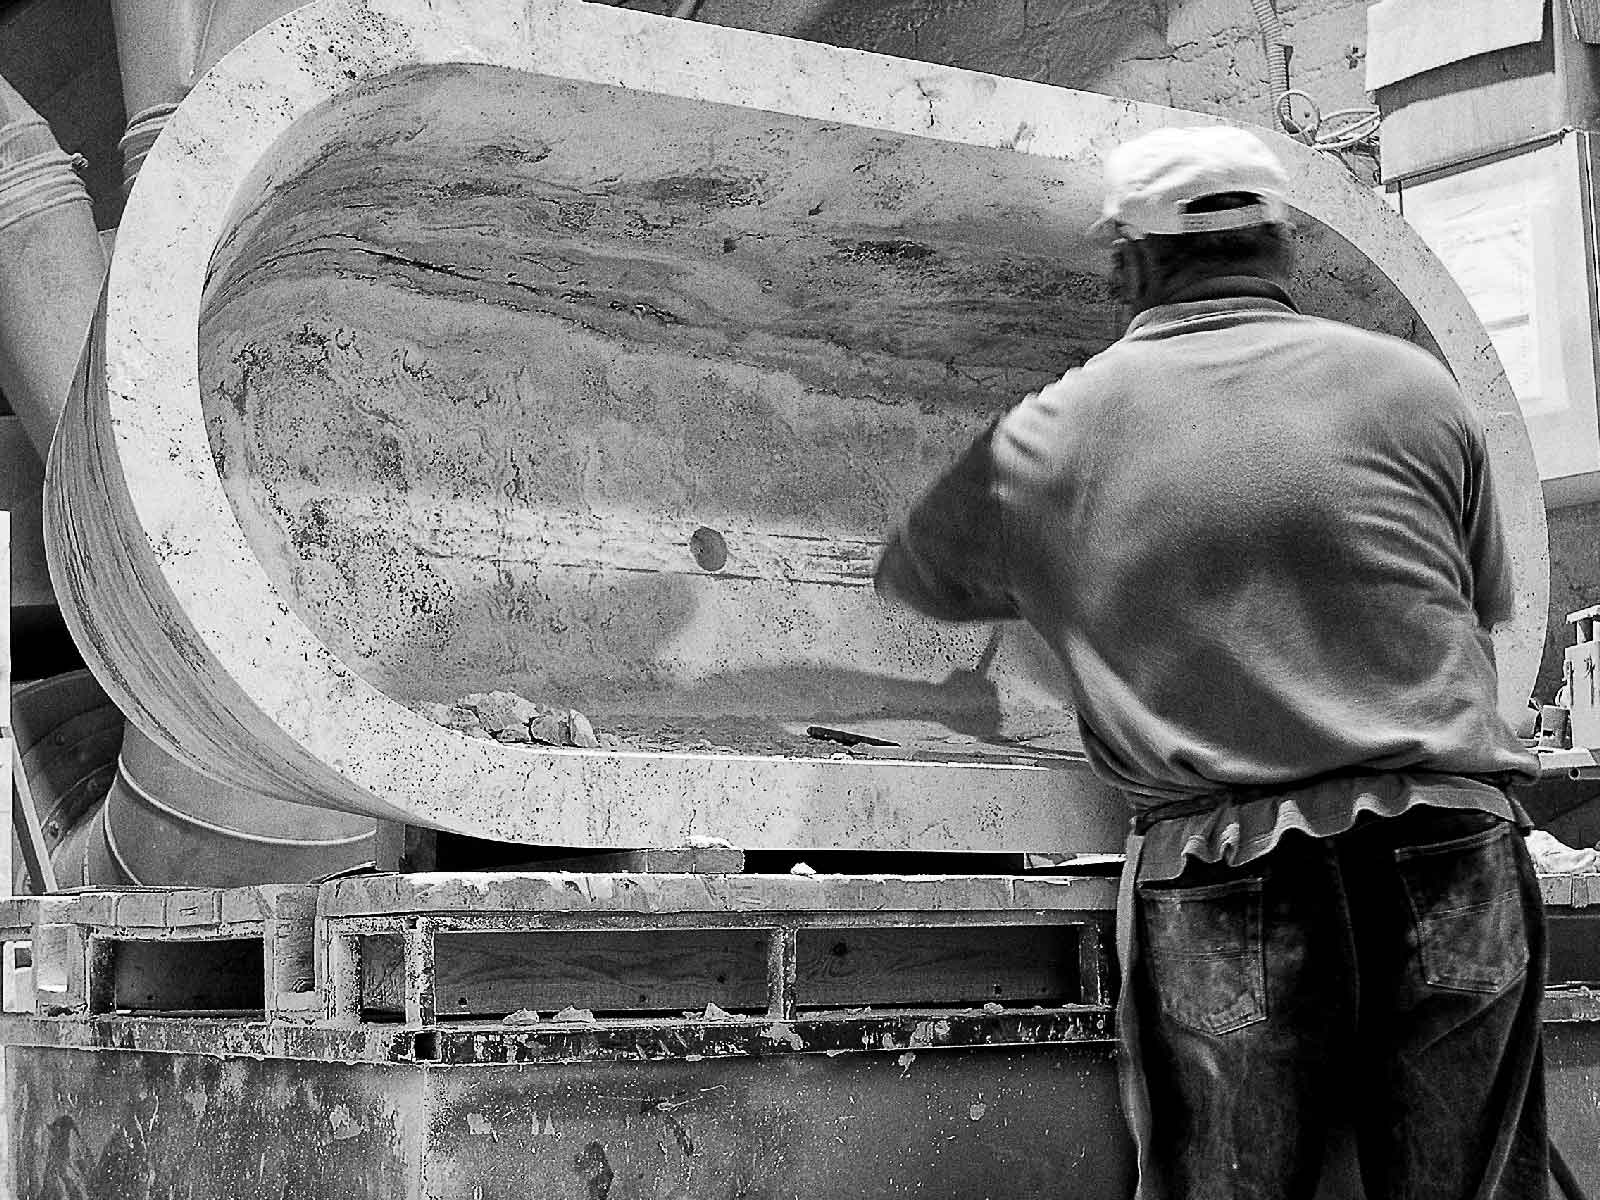 la vasca in pietra viene rifinita a mano